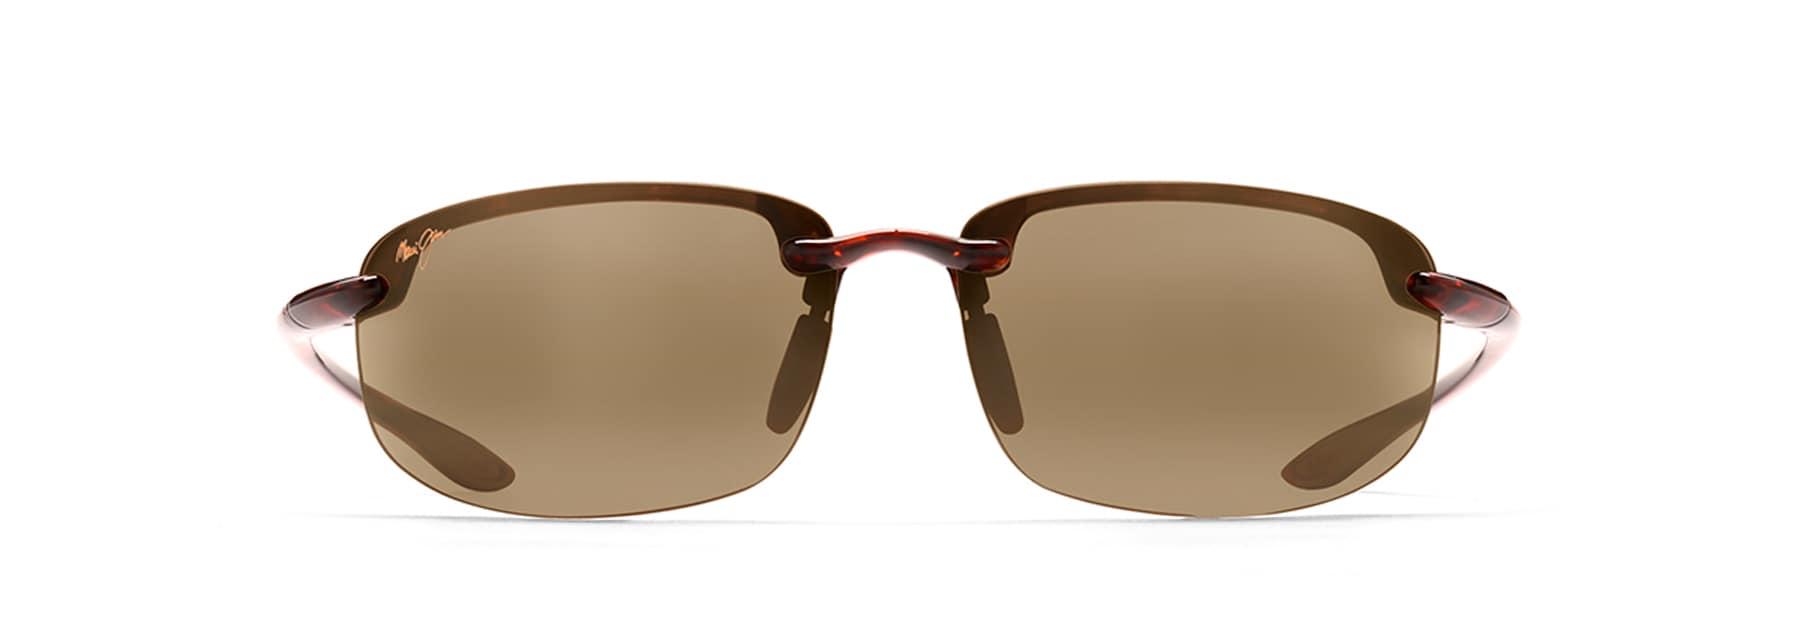 fe48aef8ddf Ho okipa Reader Polarised Sunglasses